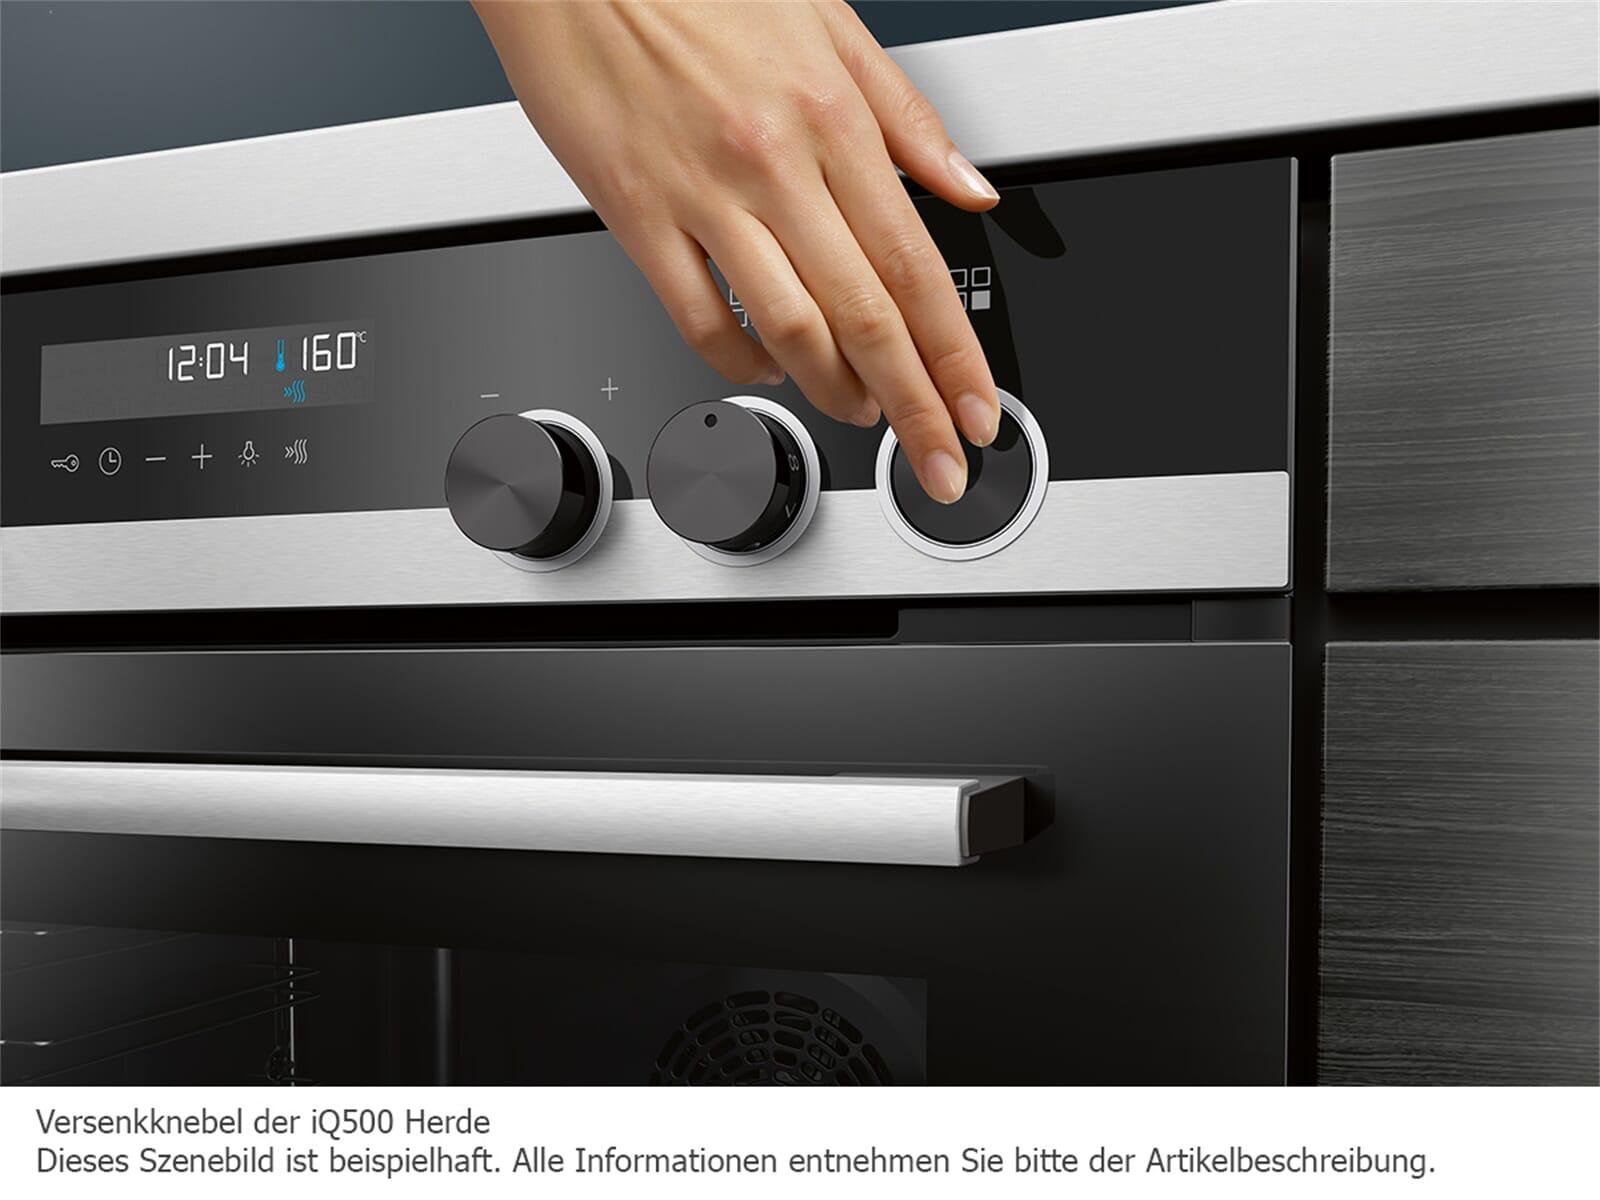 Siemens PQ521IA00 Set Einbauherd HE578ABS1 + Induktionskochfeld EI645CFB1E